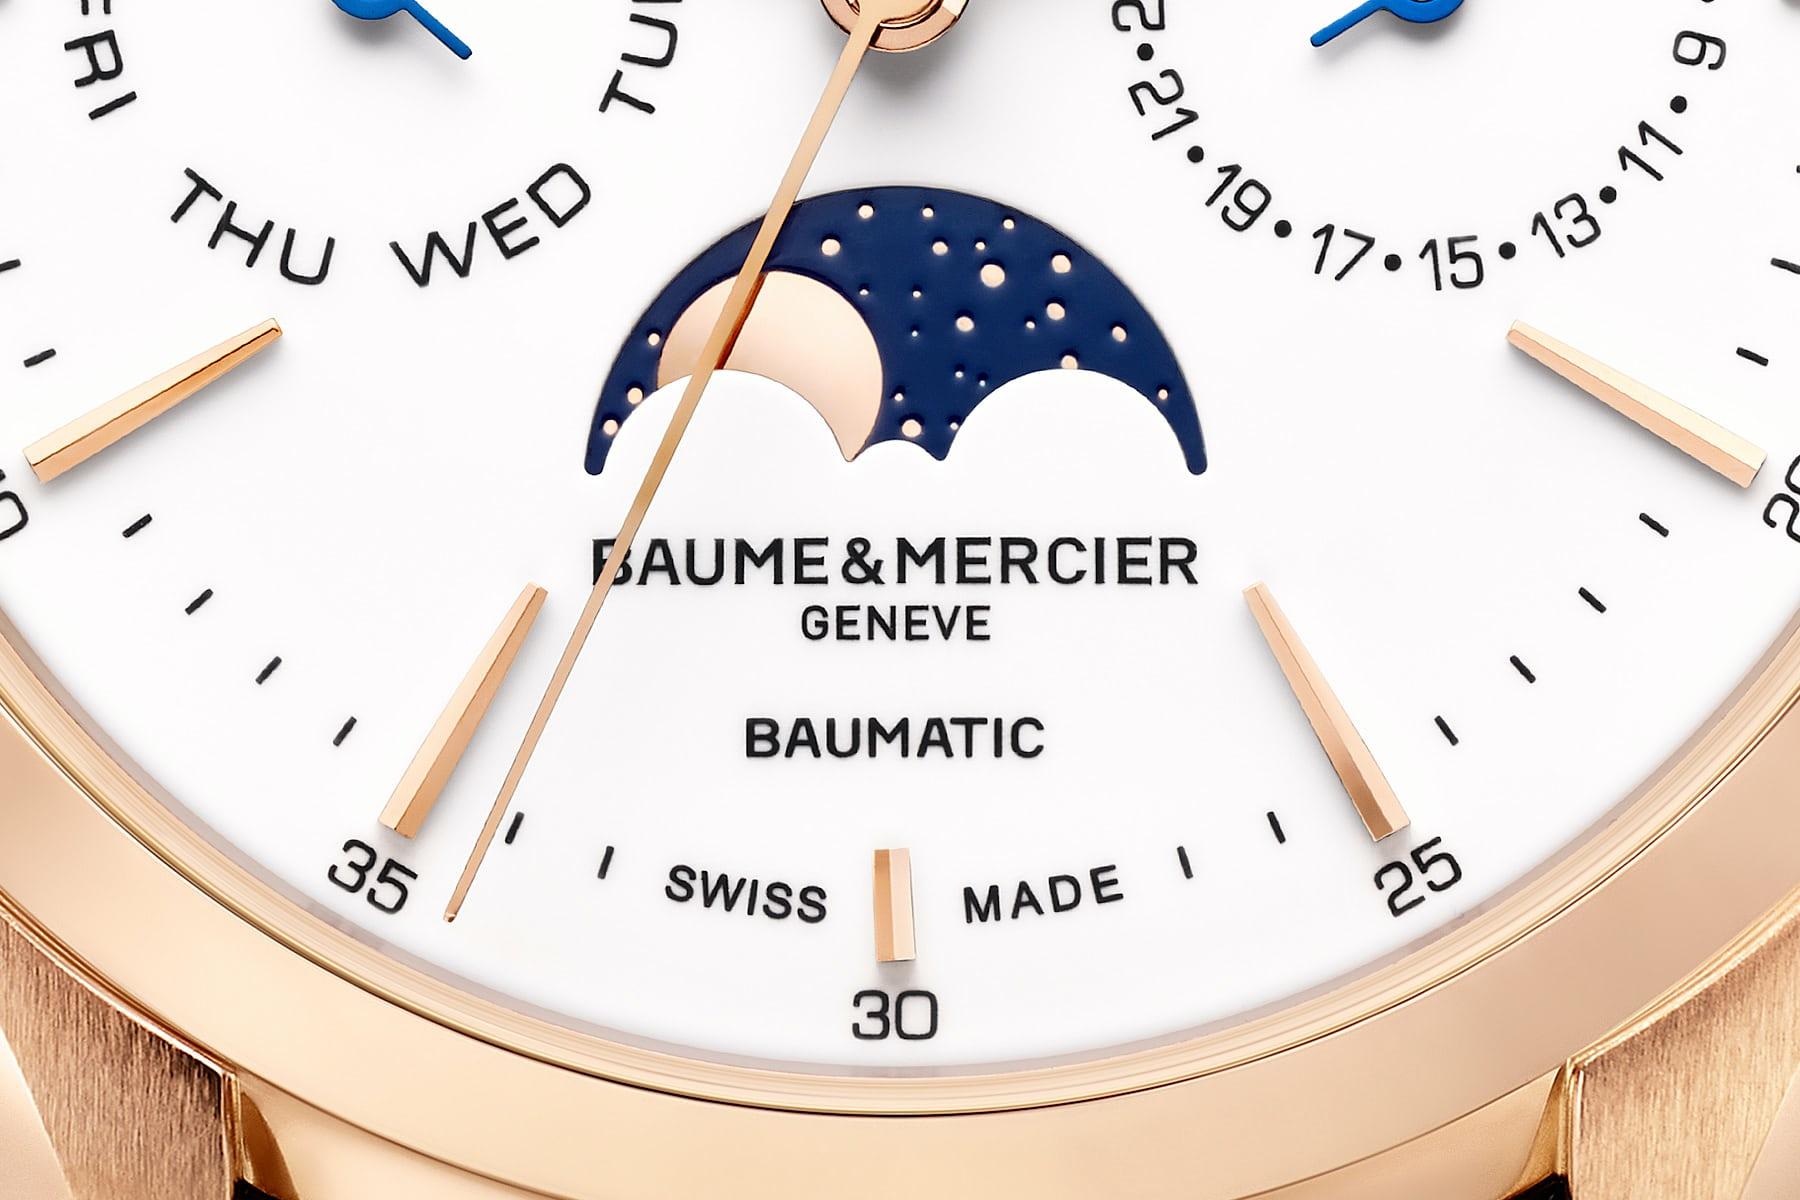 baume-mercier-clifton-baumatic-perpetual-calendar-moon-phase